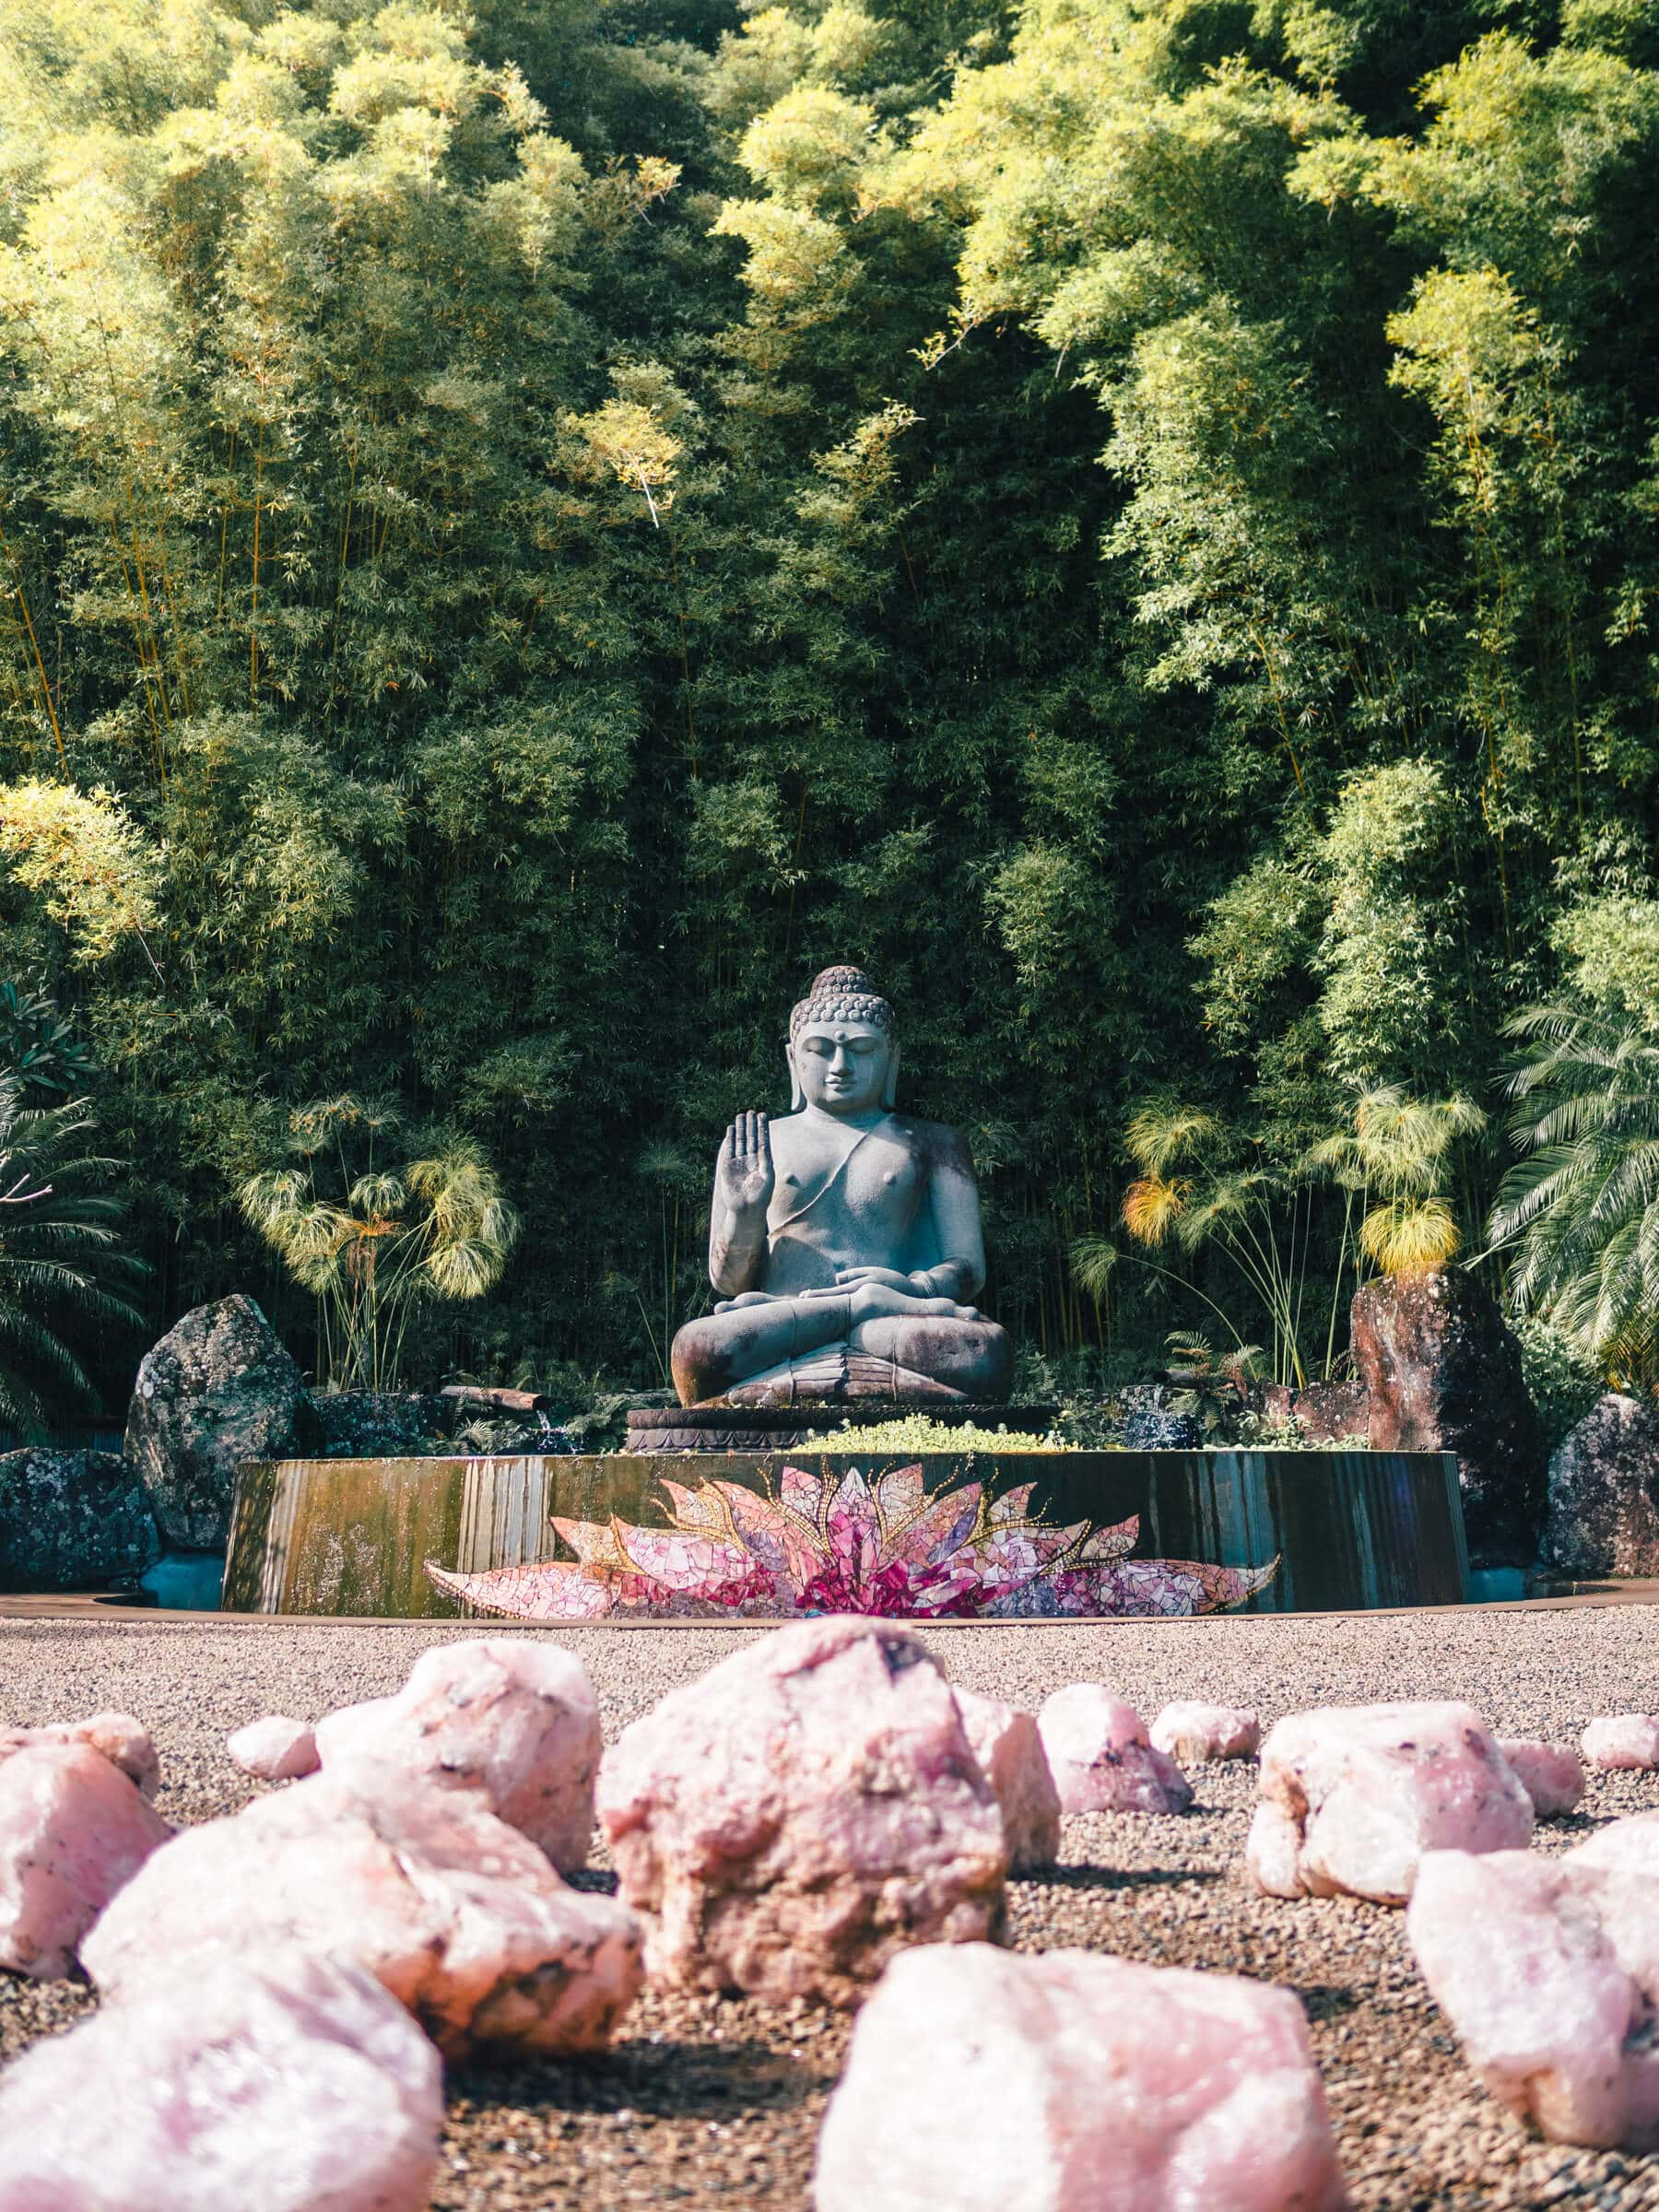 The incredibly stunning Crystal Castle & shambhala Gardens located in the Byron Bay hinterlands - The Buddha Walk